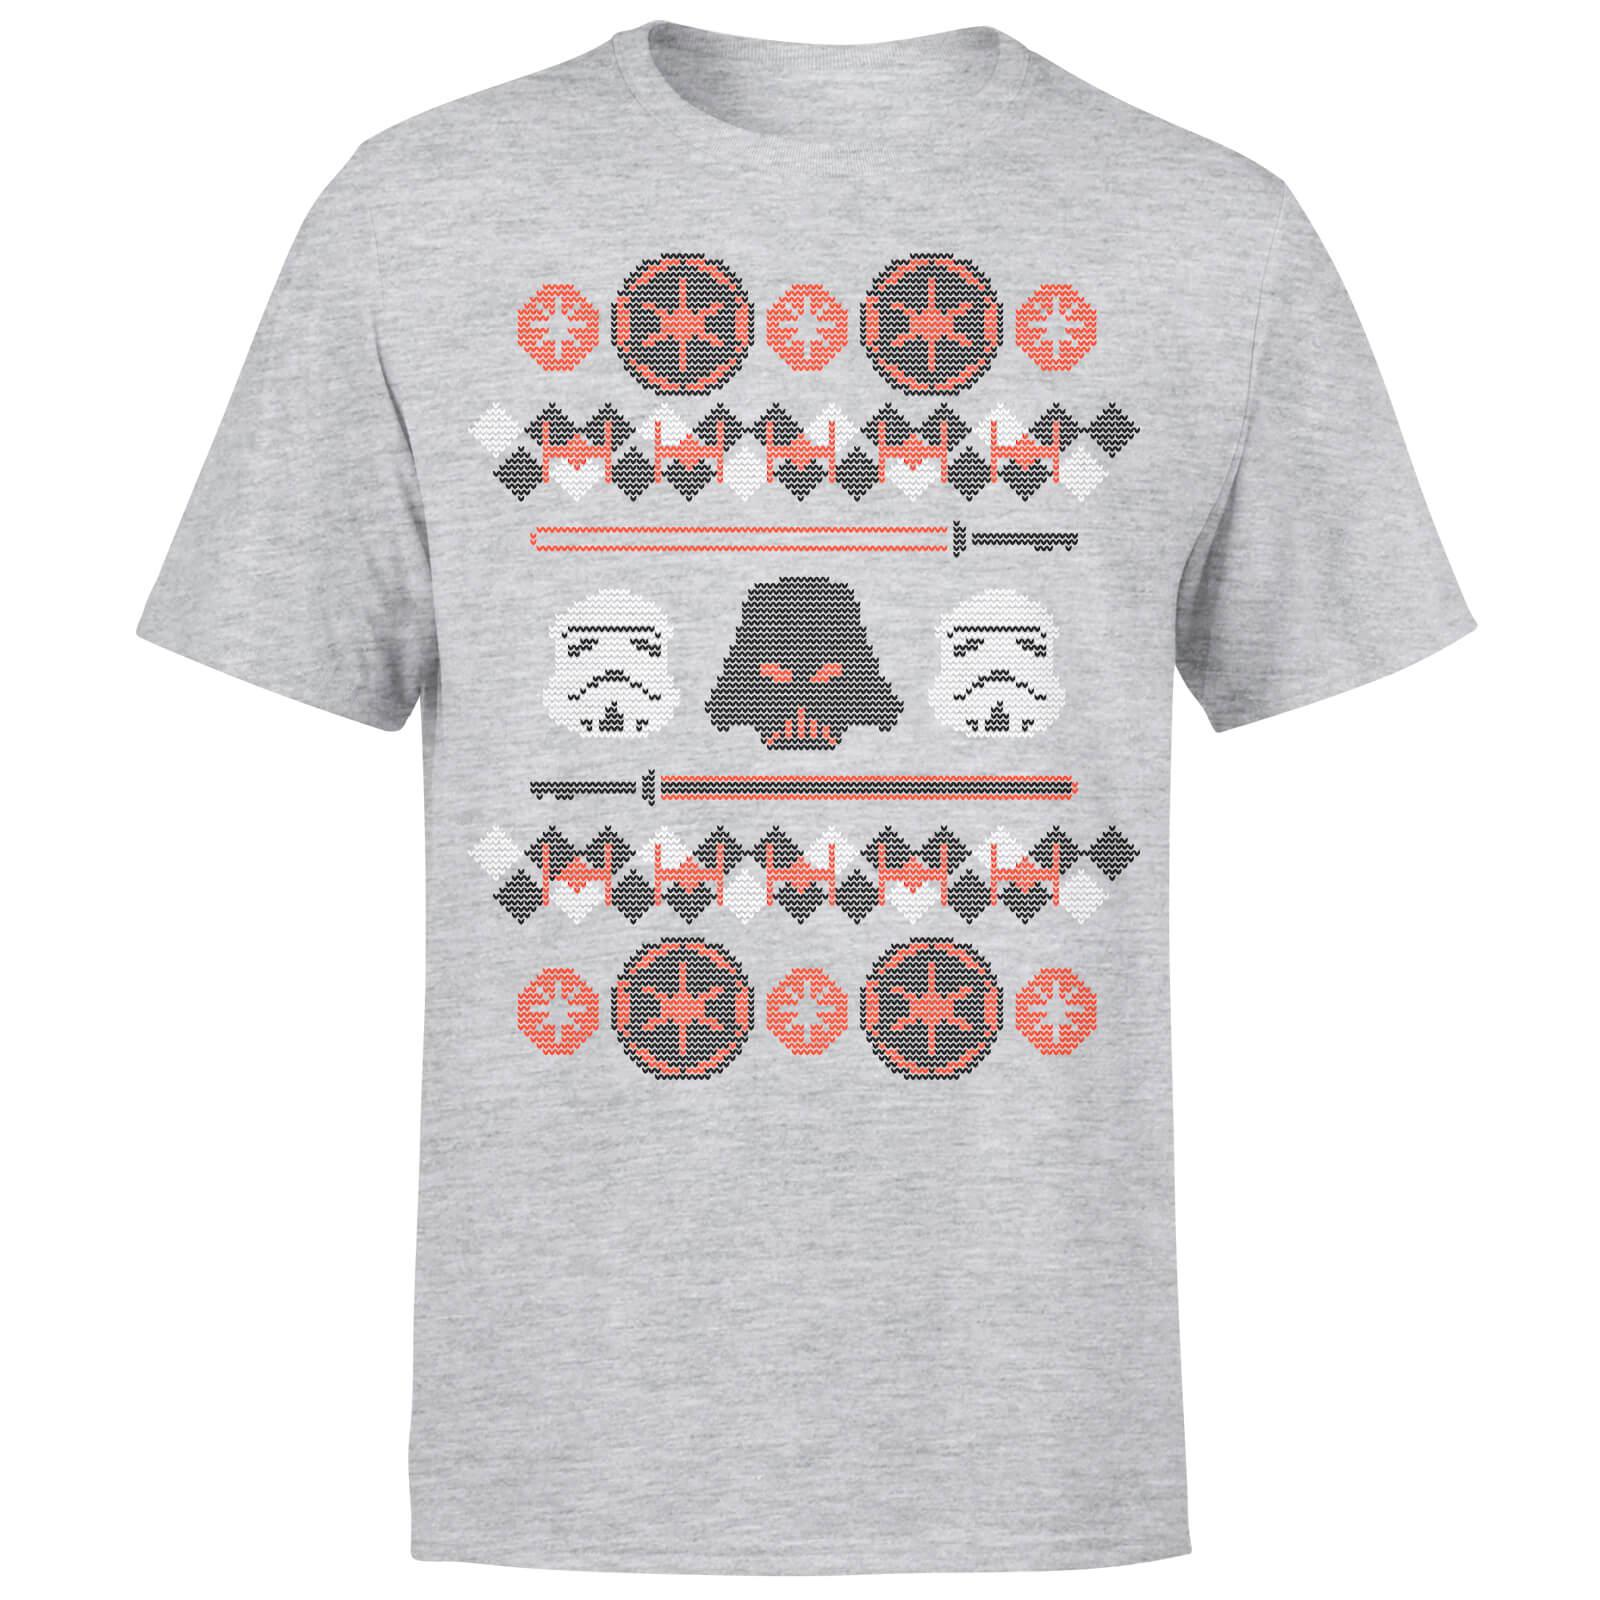 Star Wars T-Shirt Homme Sucre d'Orge Yoda Star Wars - Noir - S - Gris